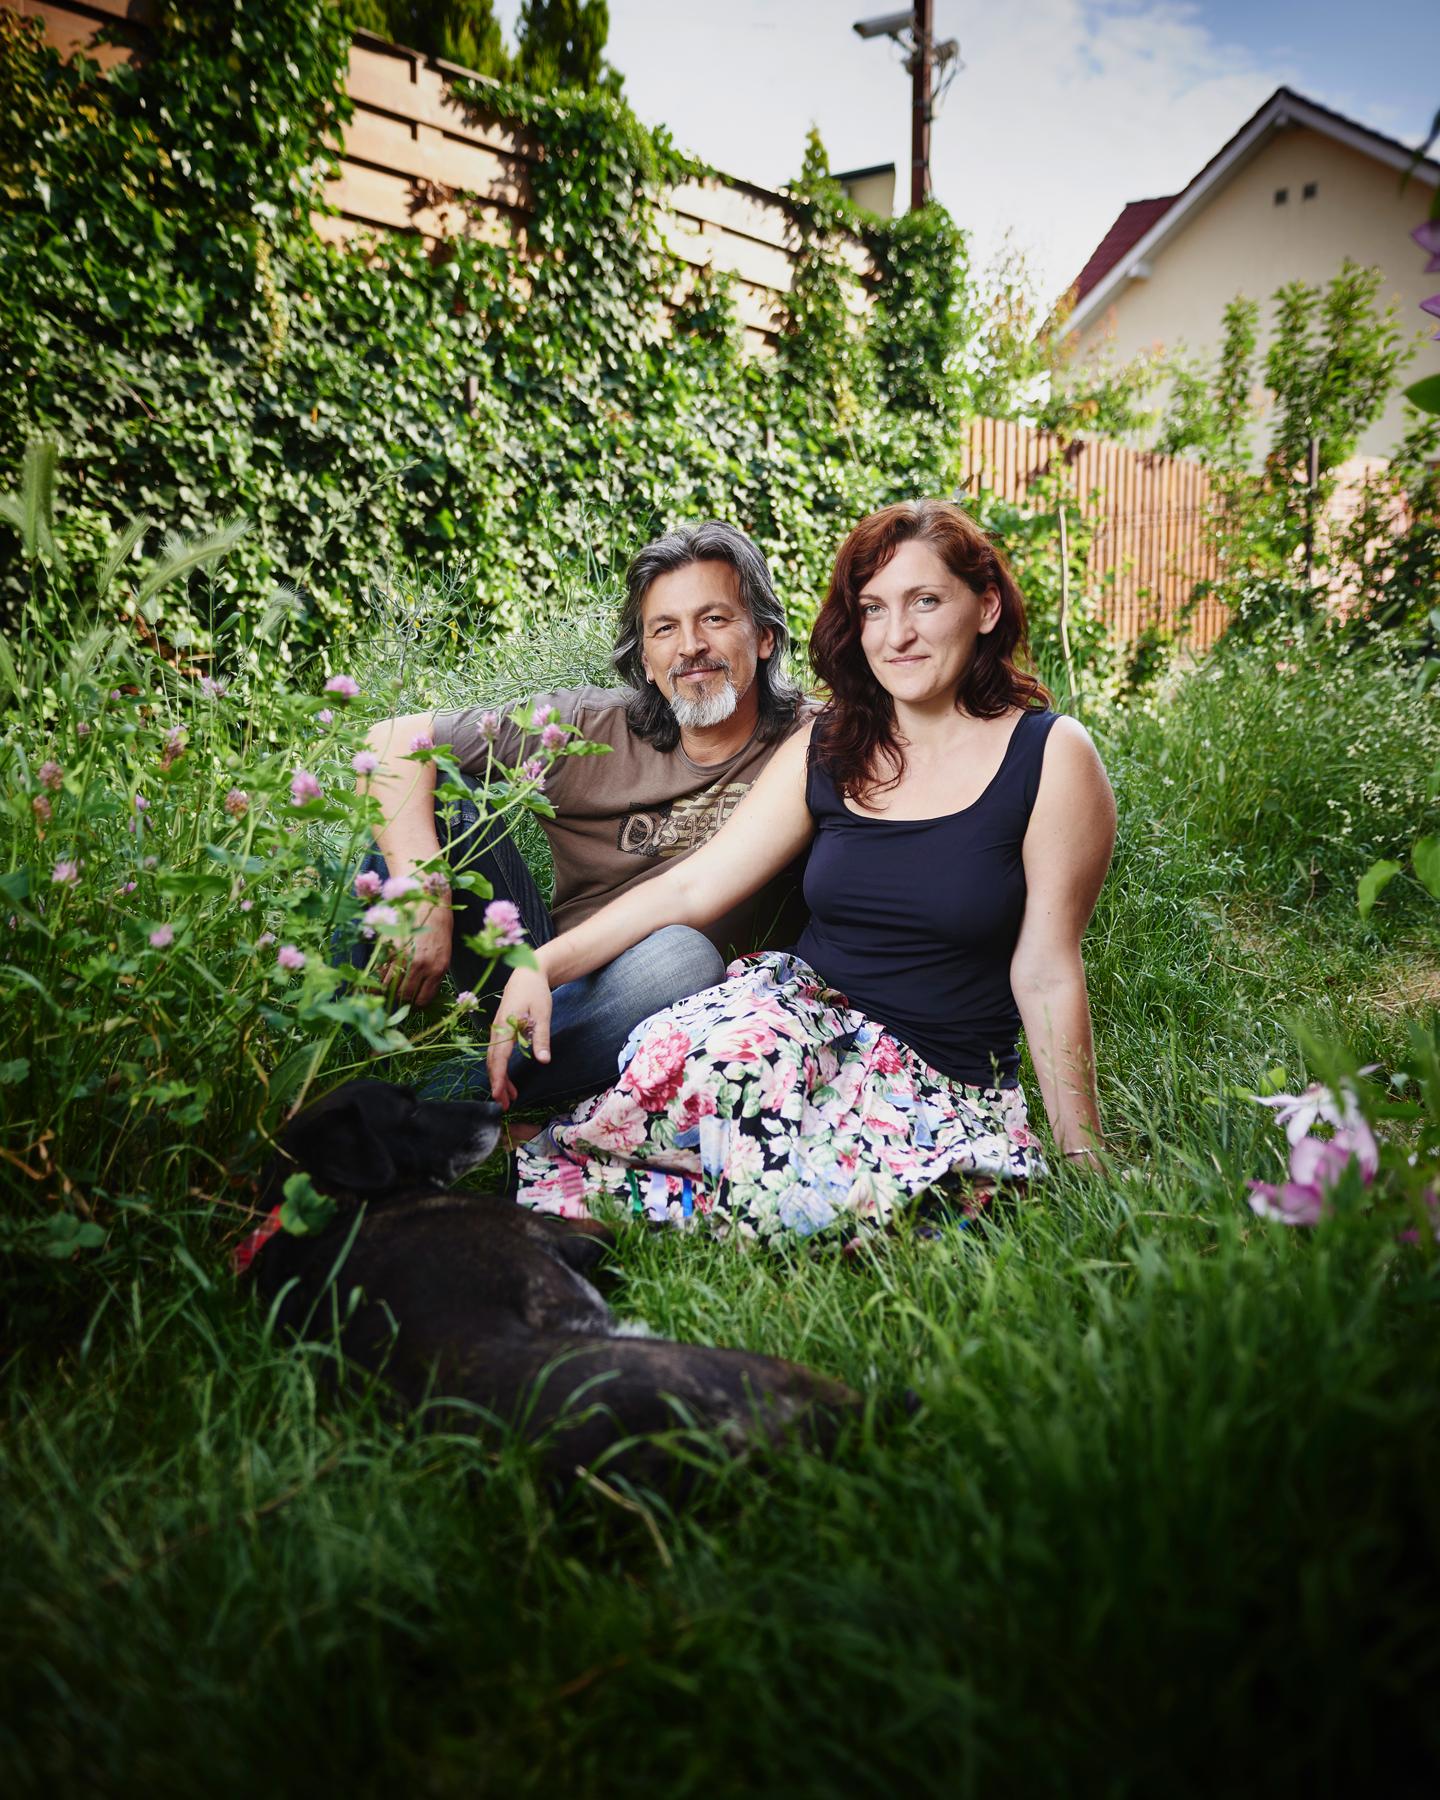 Ro activ, Adela & Dan, Casa de cultura permanent, ©Nicolas Friess